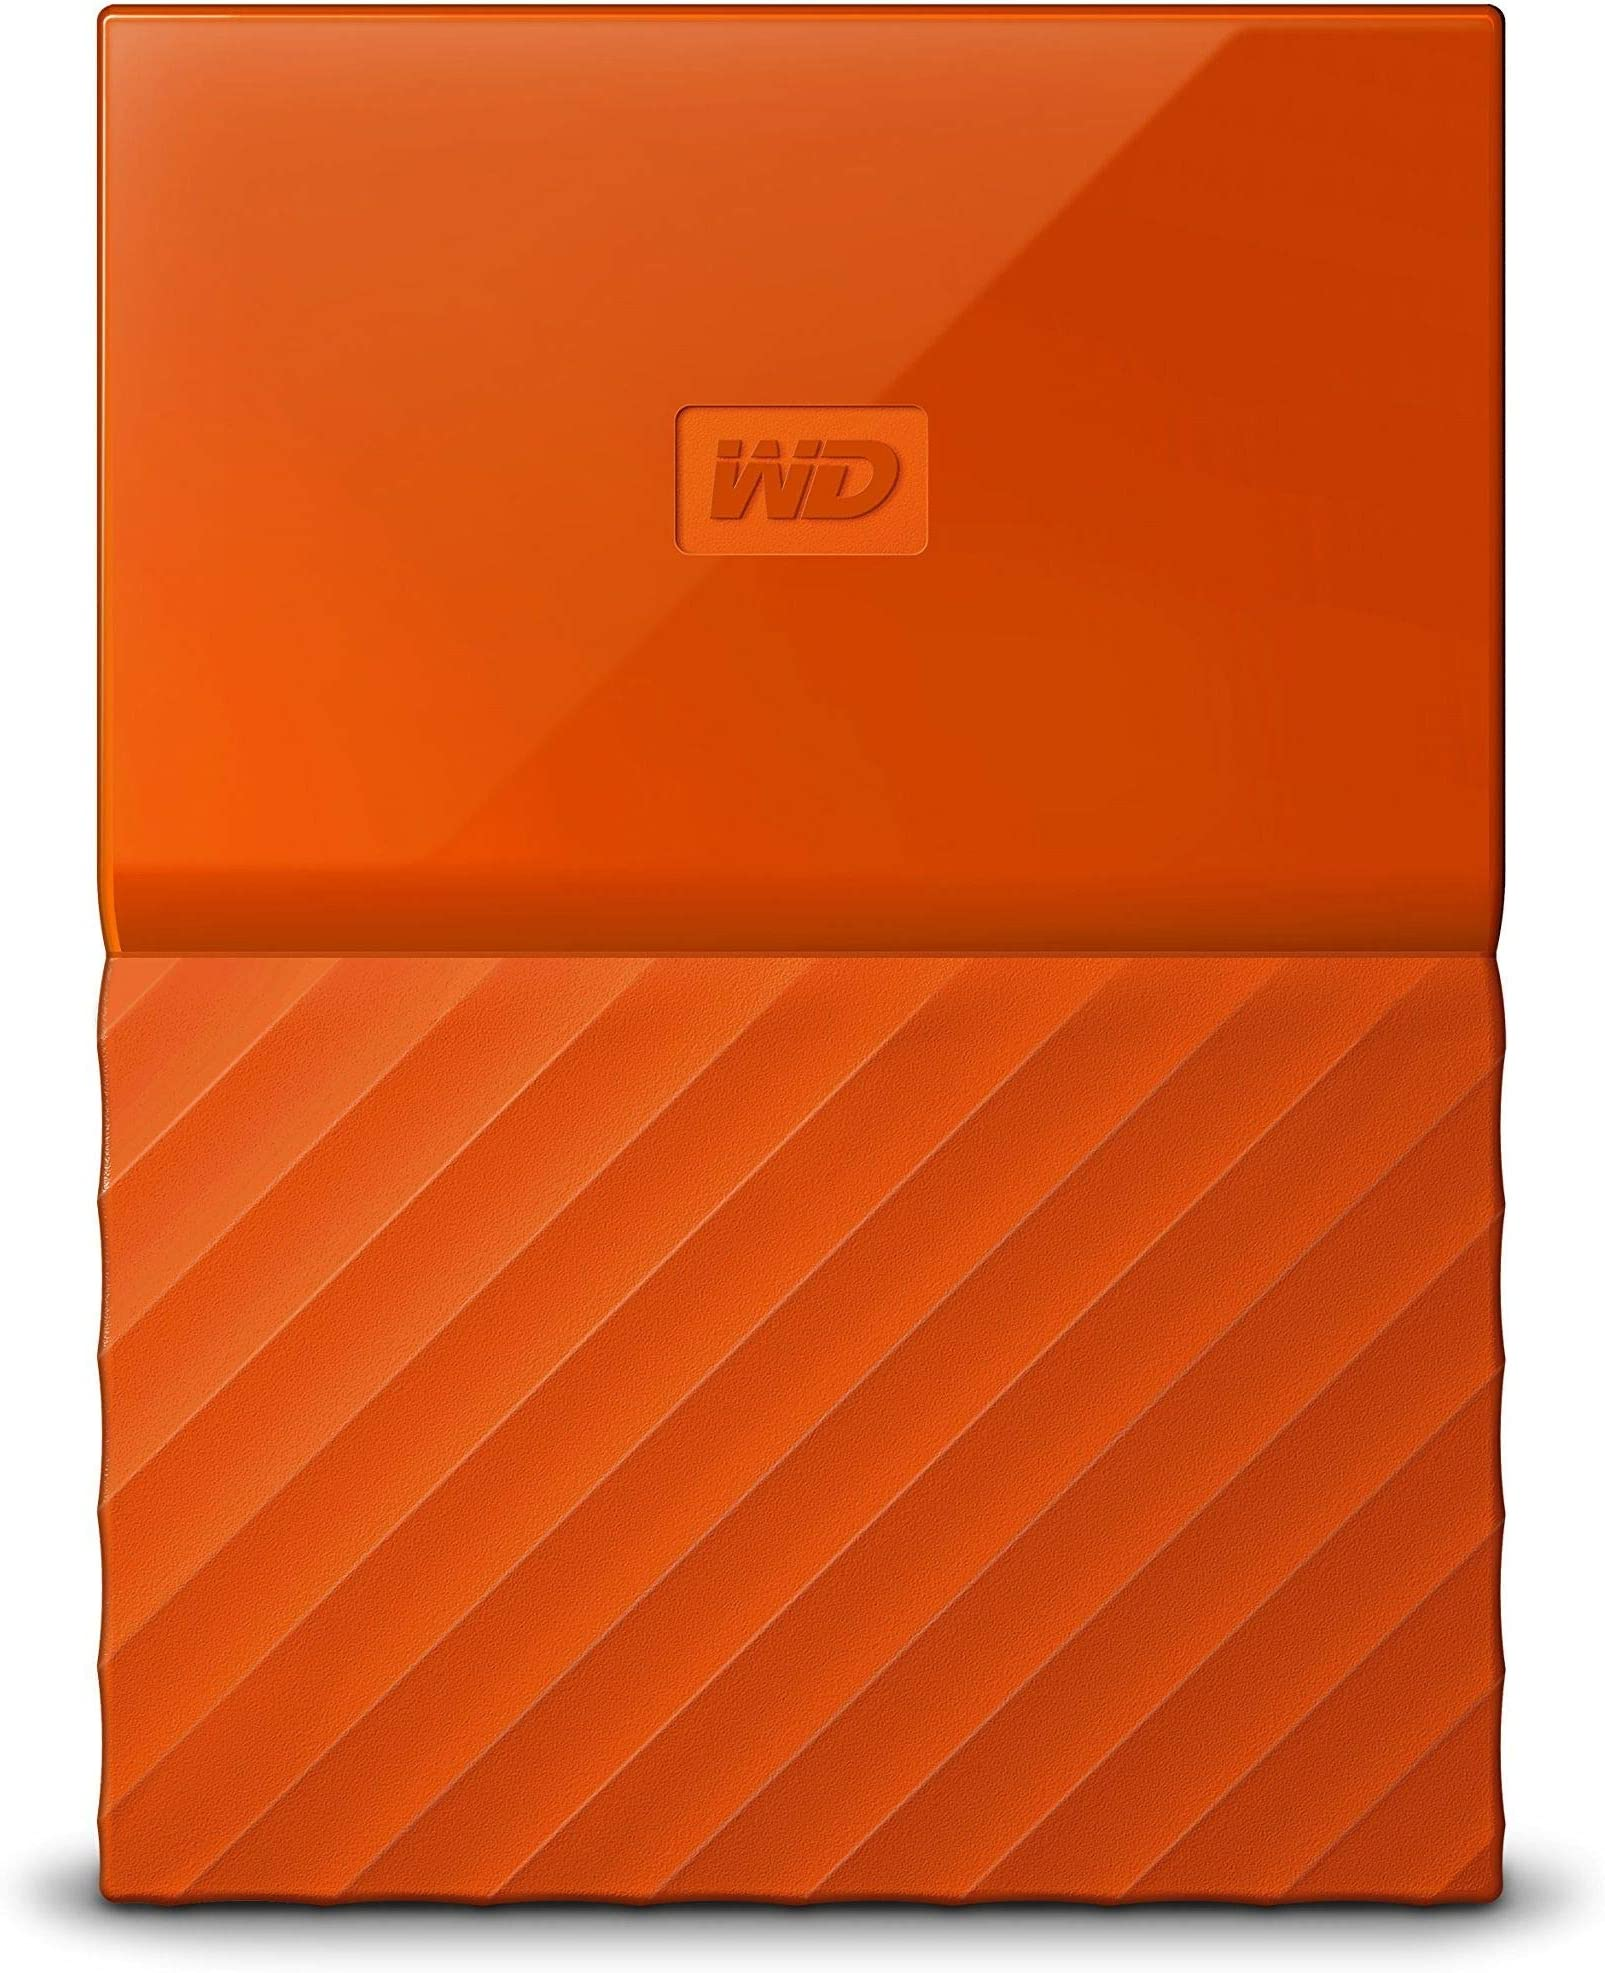 WD 4TB Orange My Passport Portable External Hard Drive - USB 3.0 - WDBYFT0040BOR-WESN